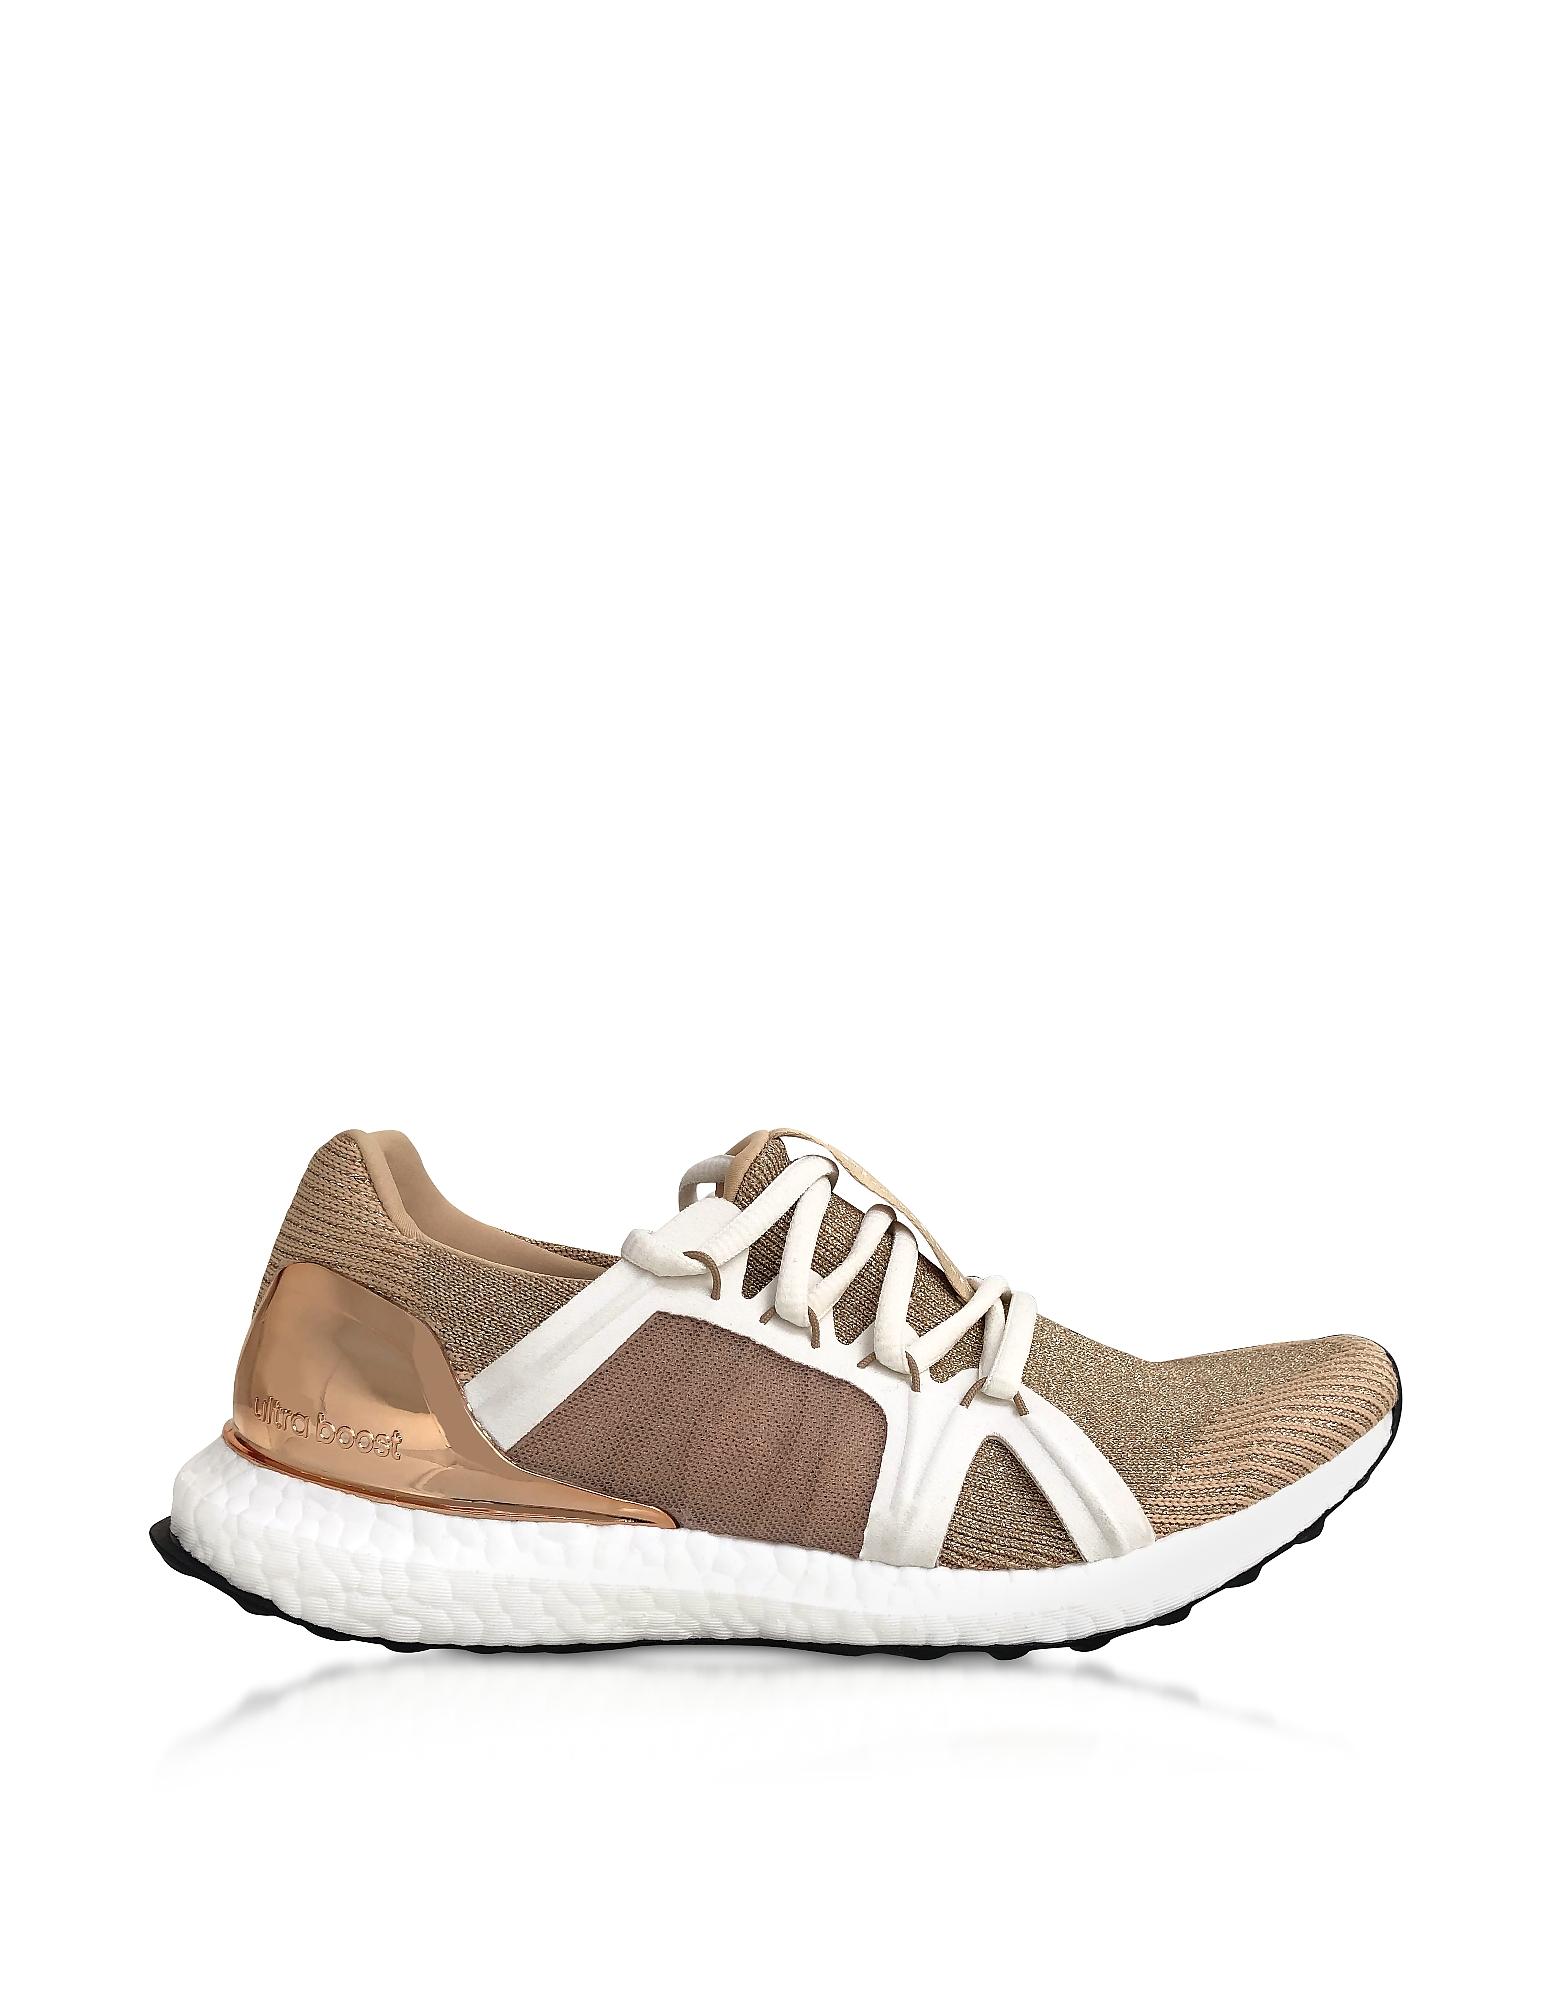 Adidas Stella McCartney Designer Shoes, Rose Gold UltraBOOST Sneakers